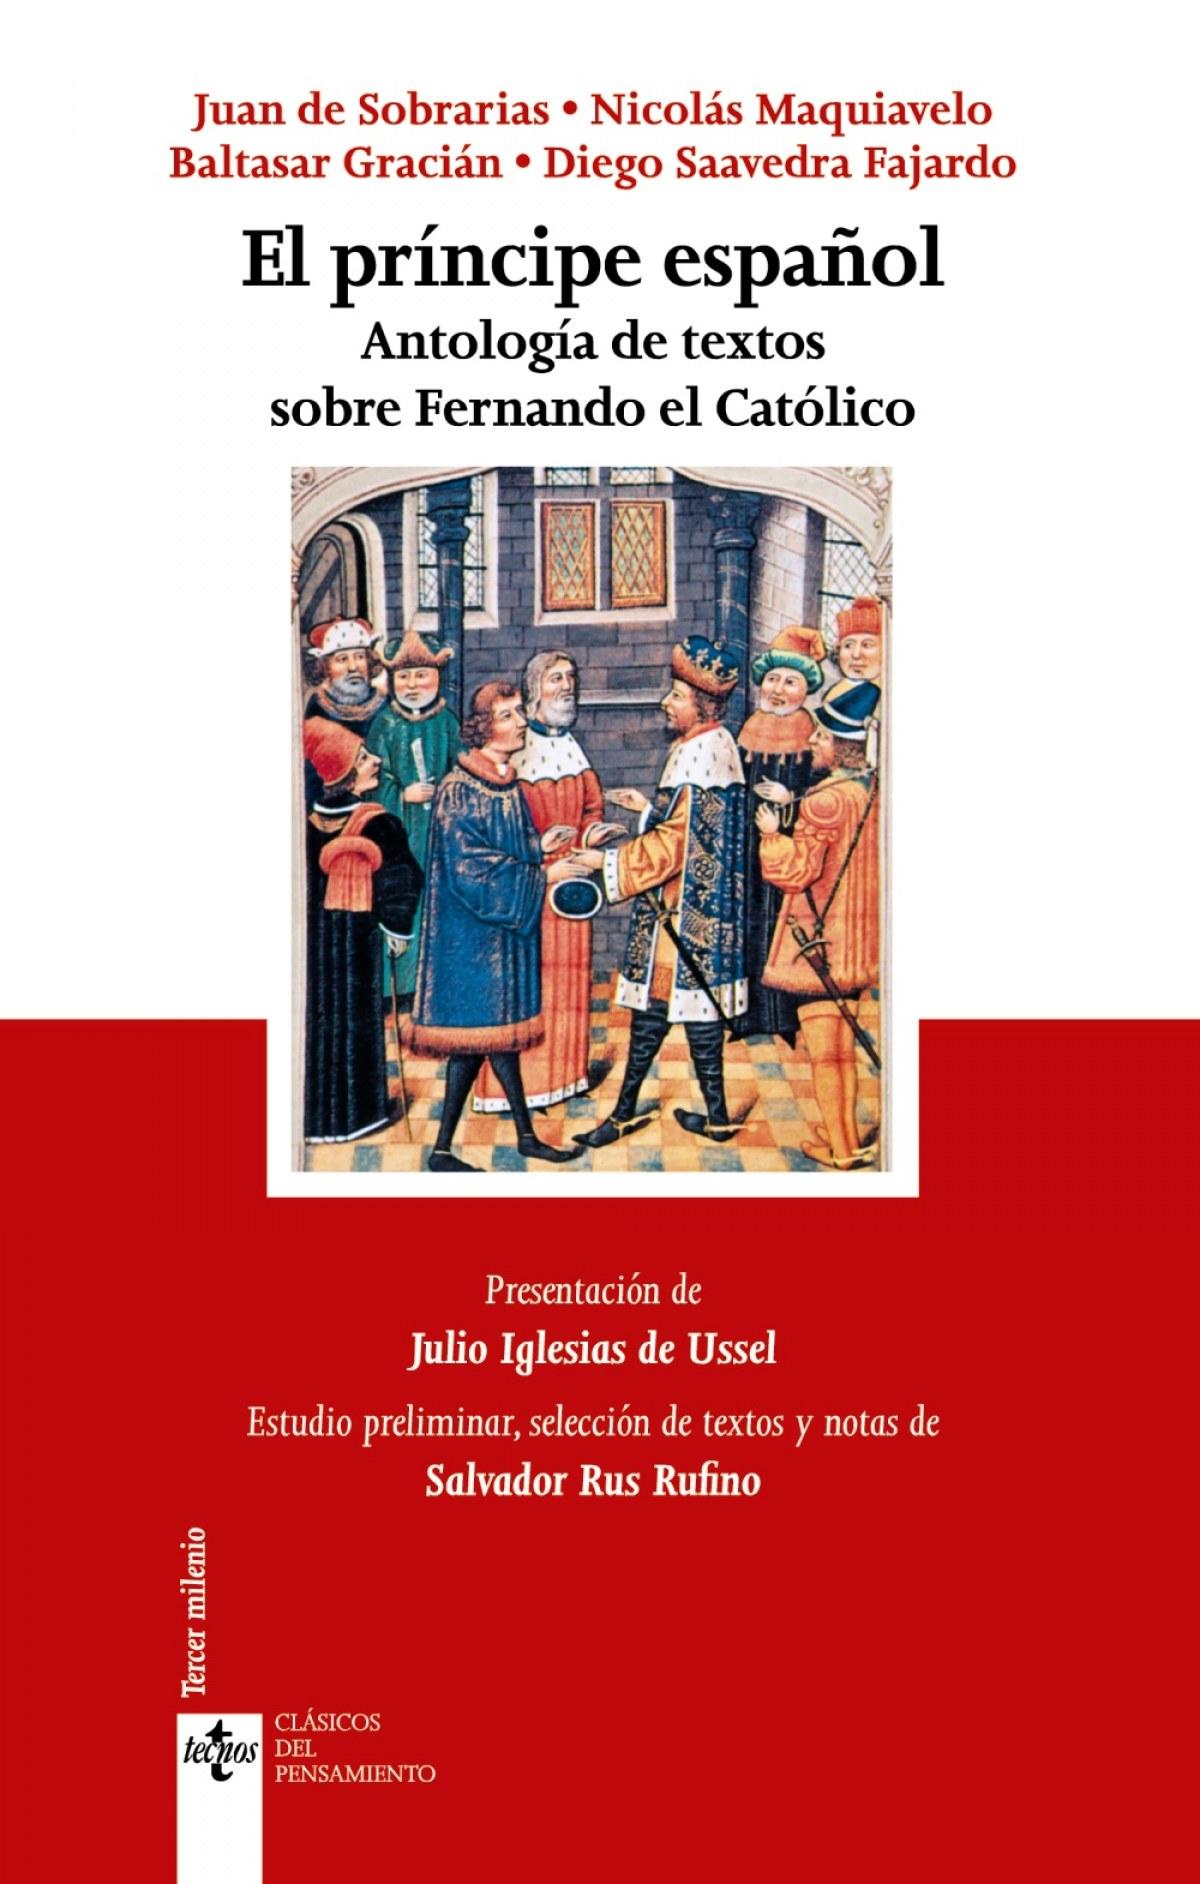 El pr¡ncipe español 9788430961894